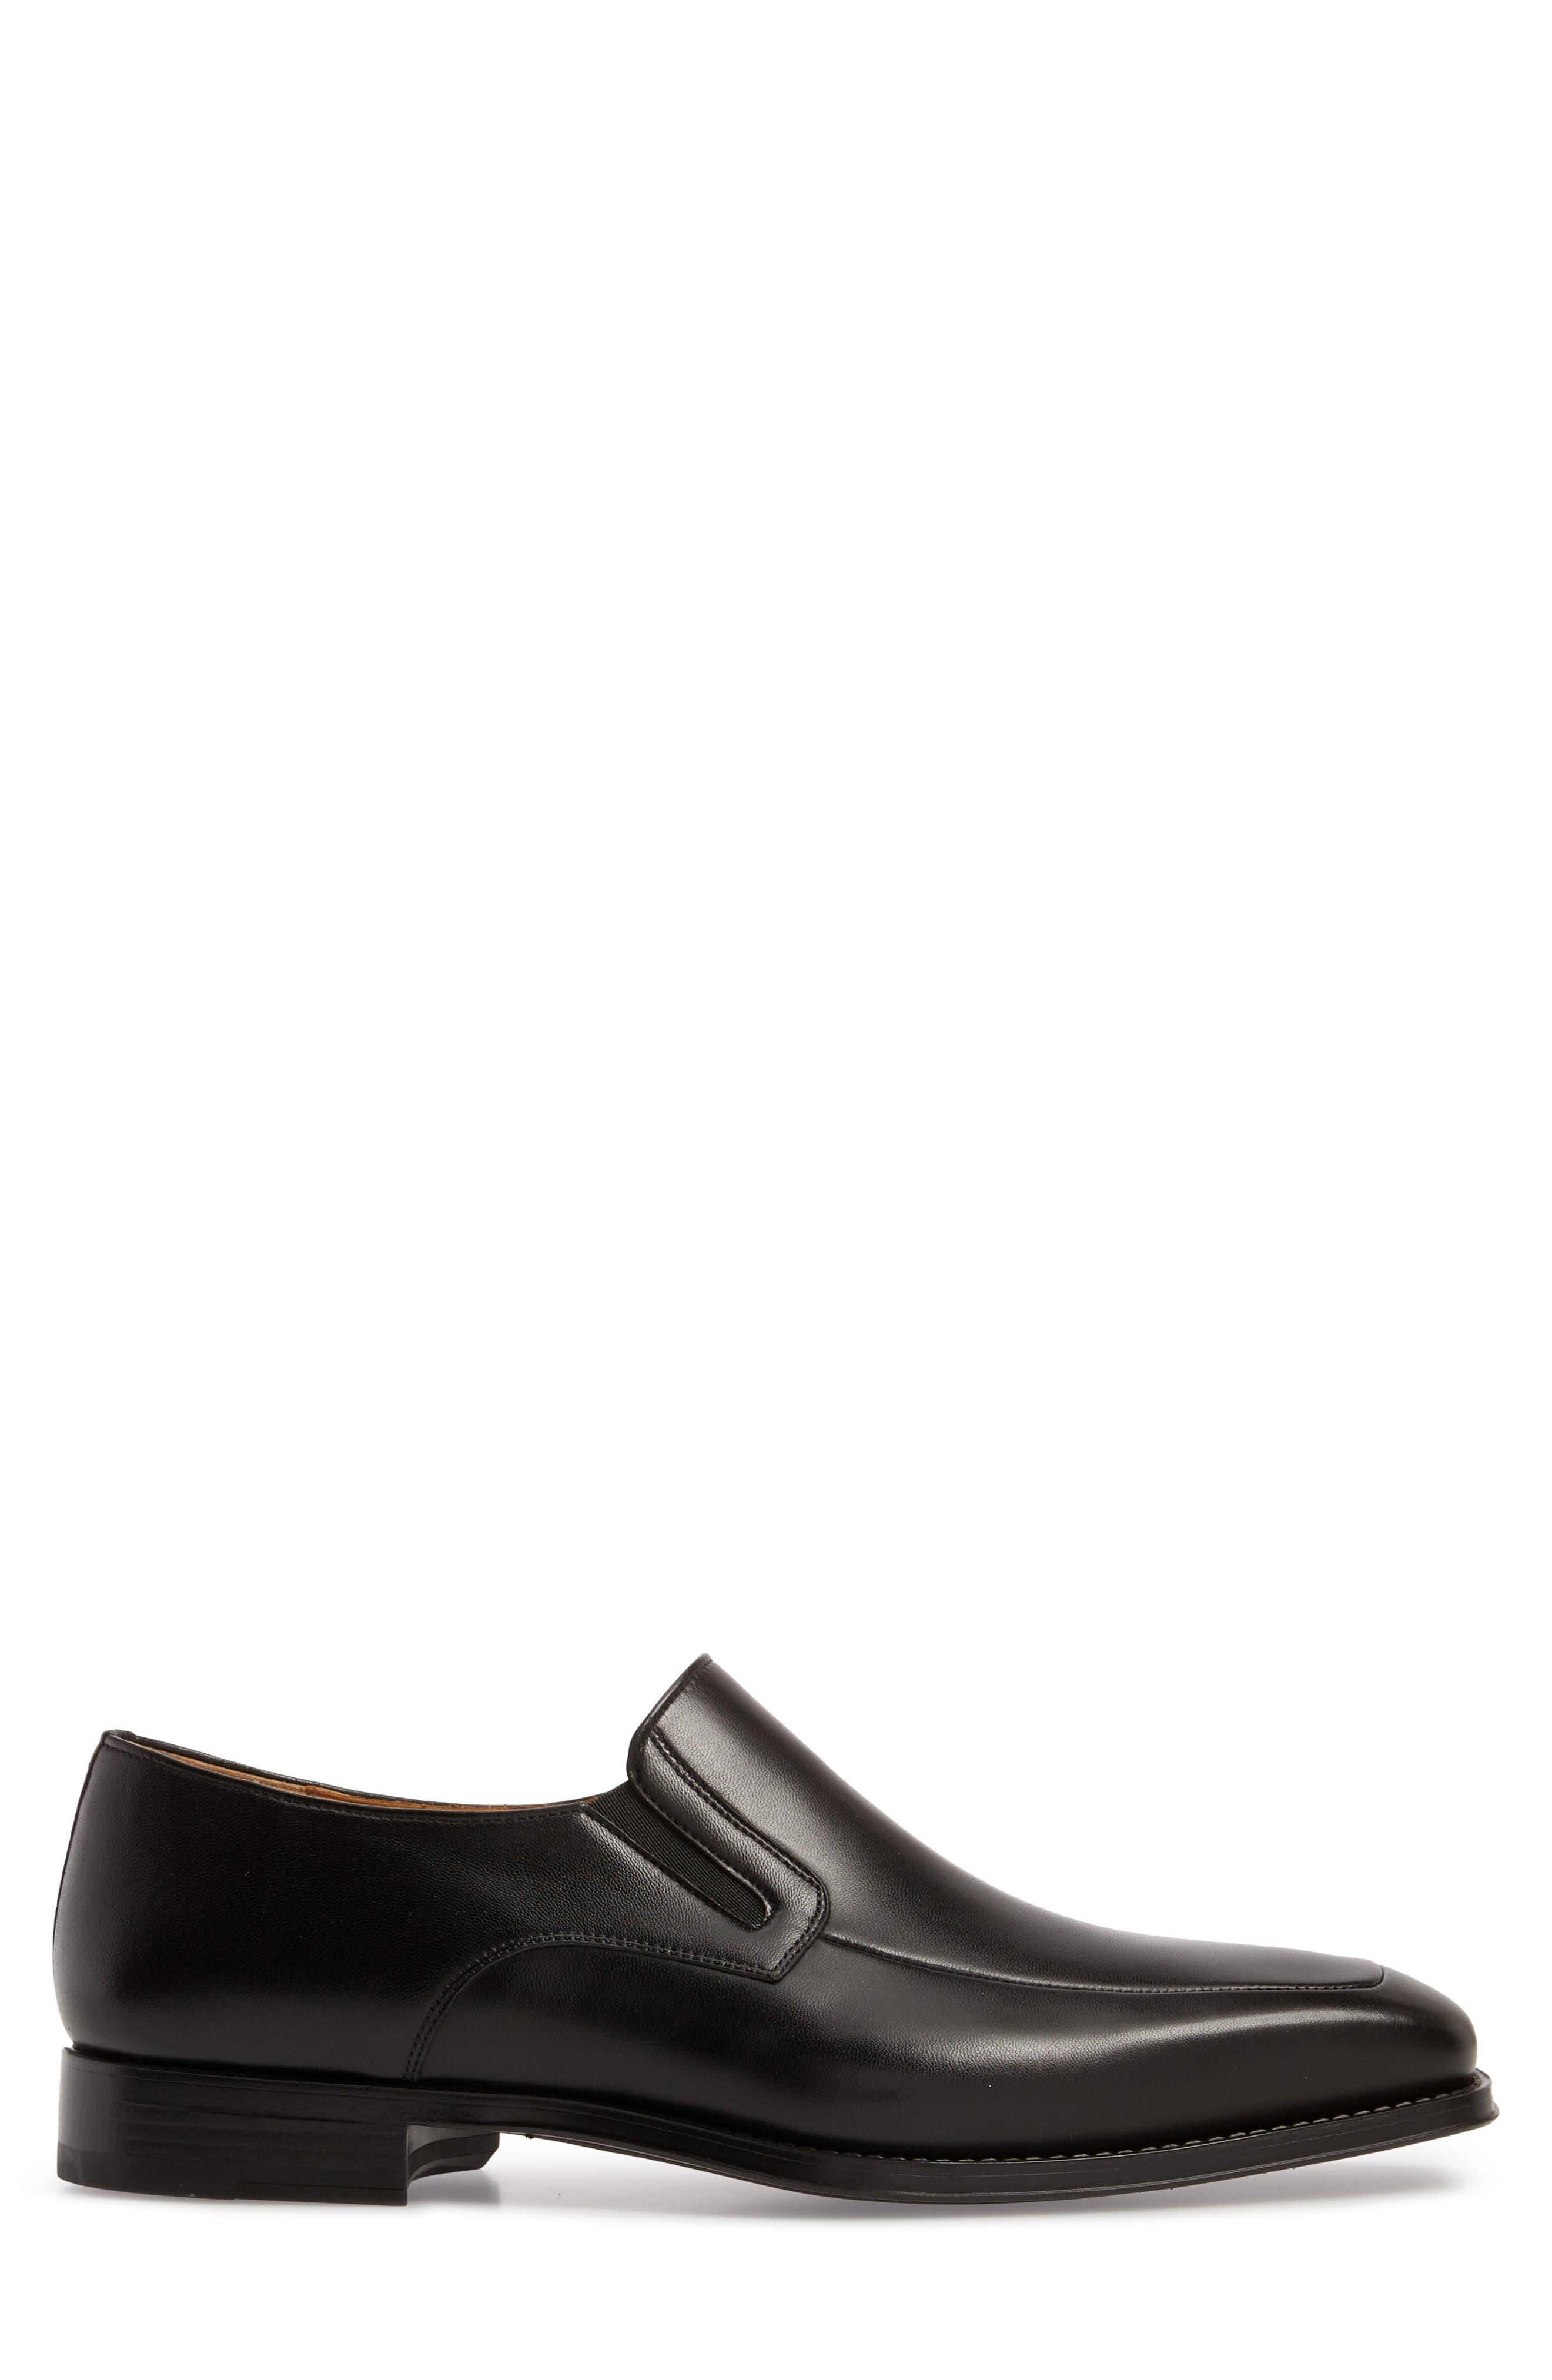 Fabricio Apron Toe Slip-On,                             Alternate thumbnail 5, color,                             Black Leather